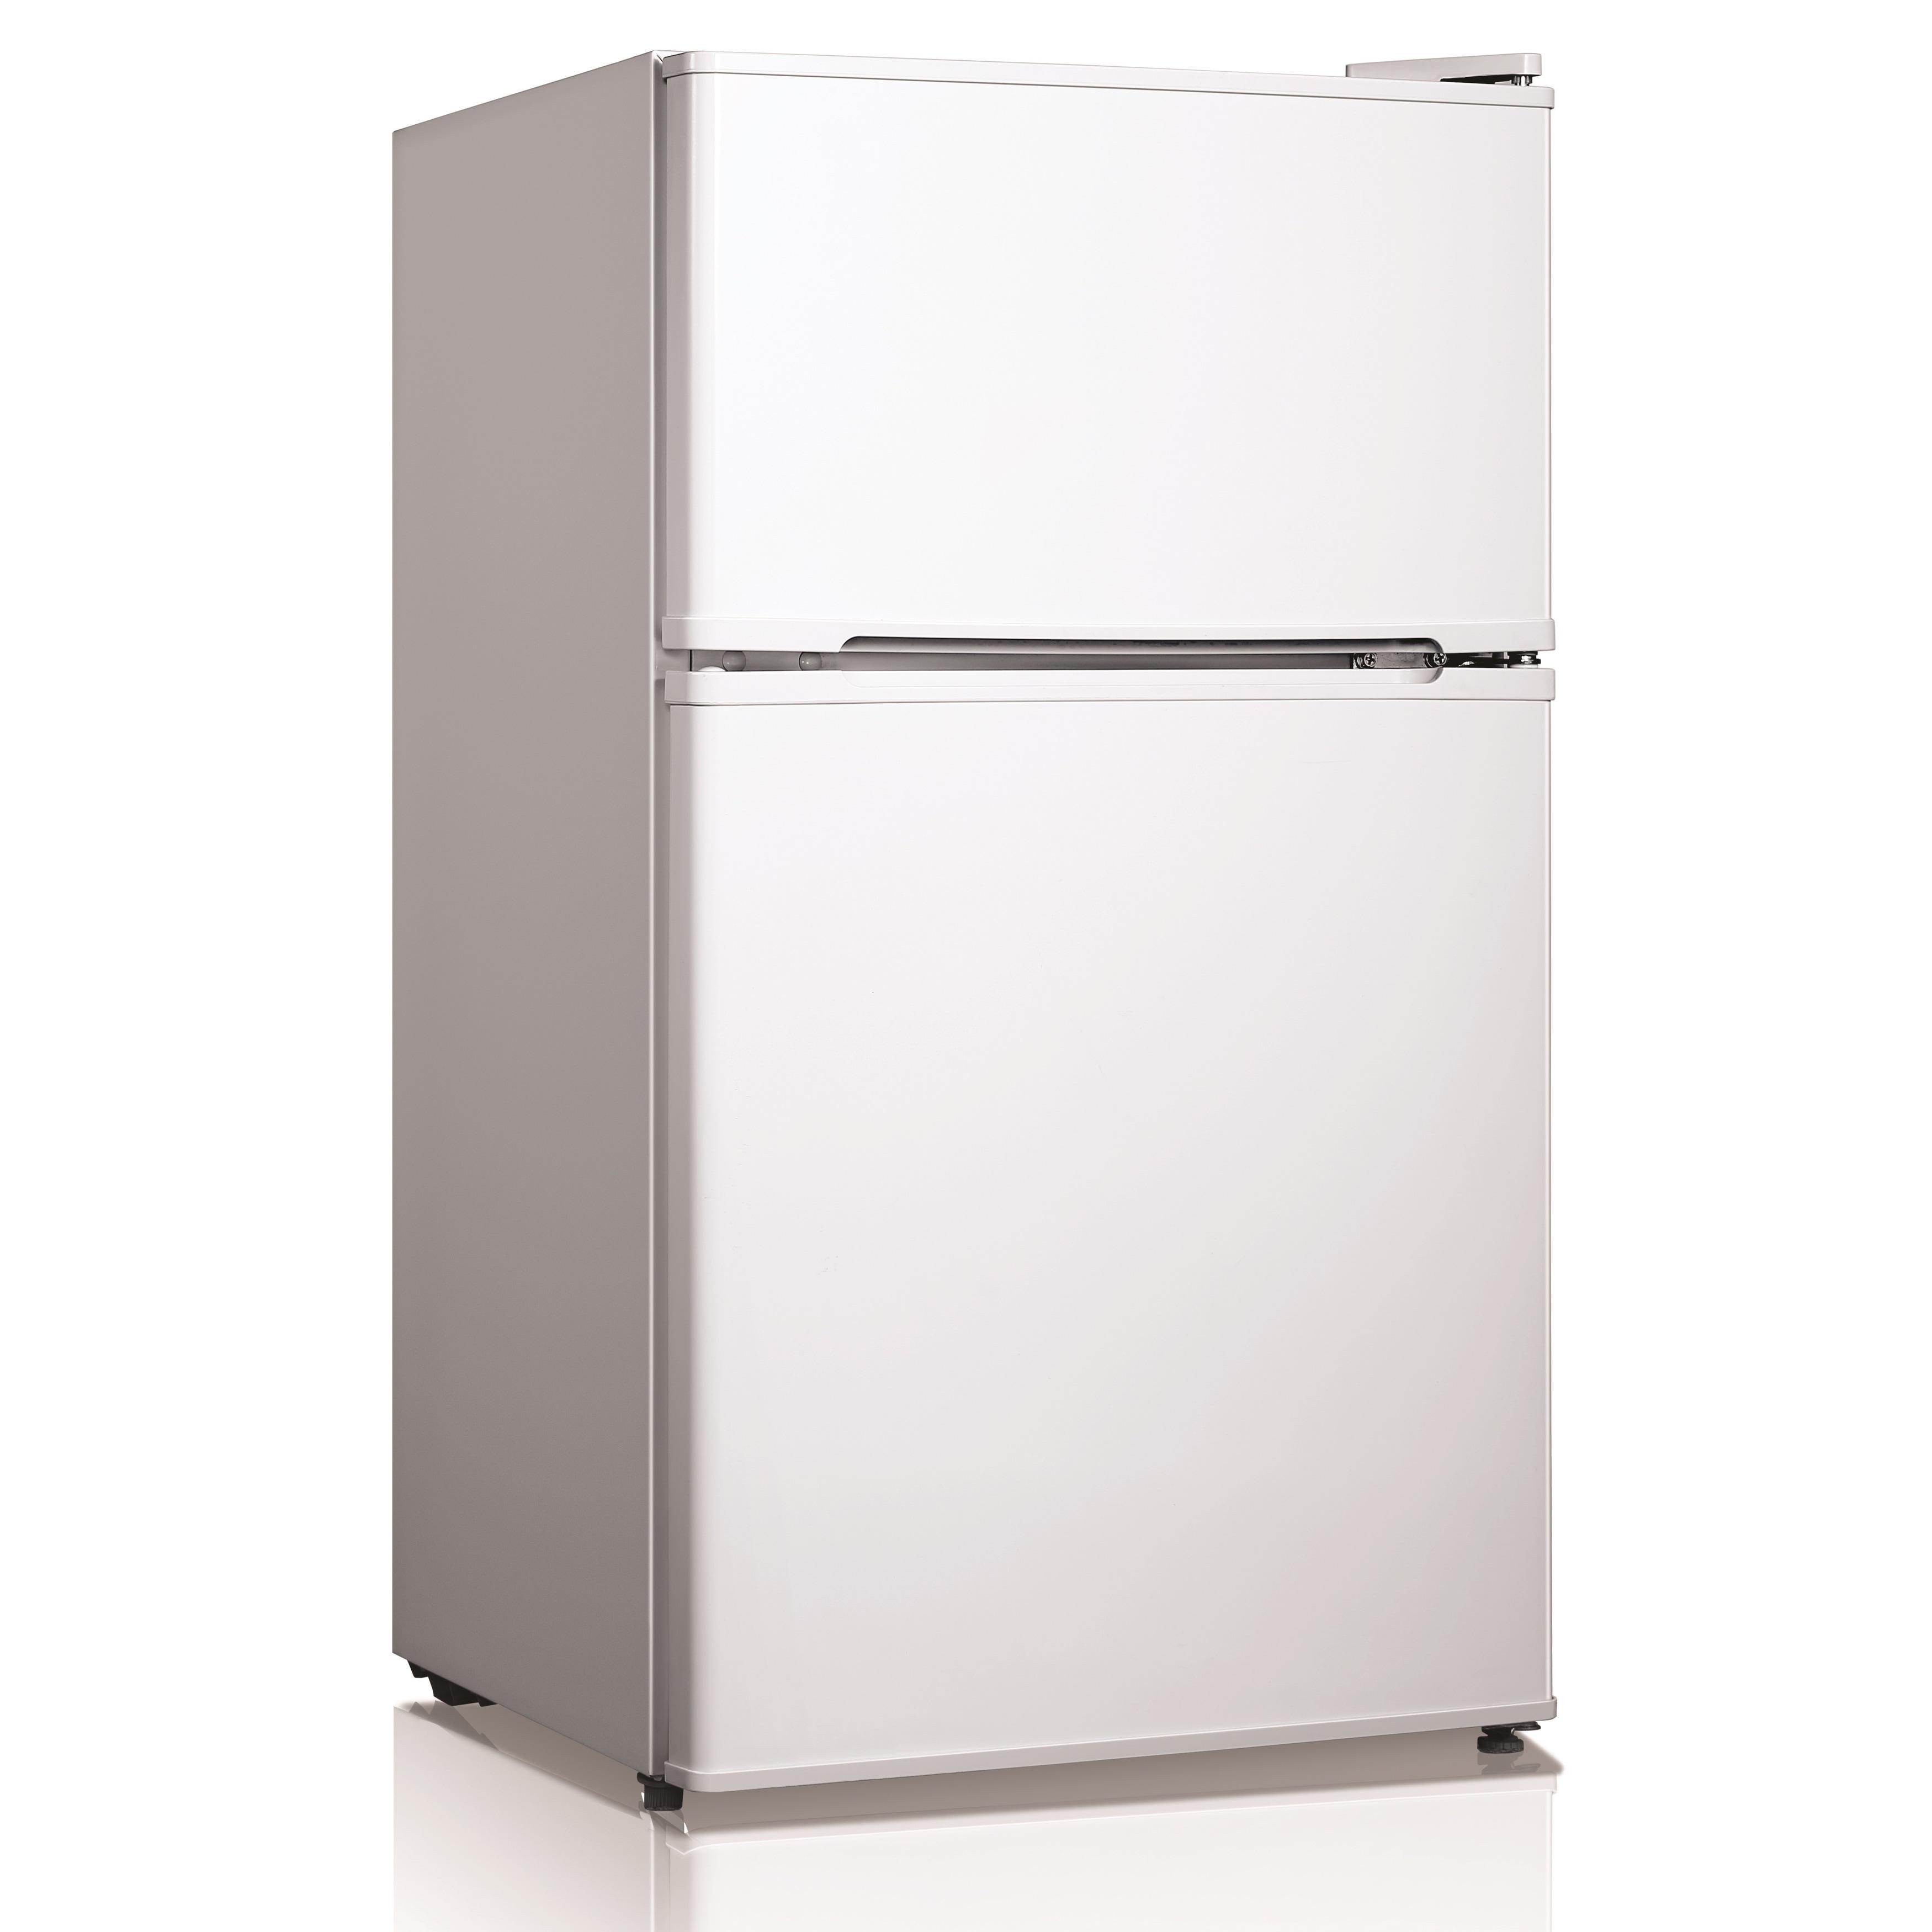 Midea 2 Door Refrigerator, White